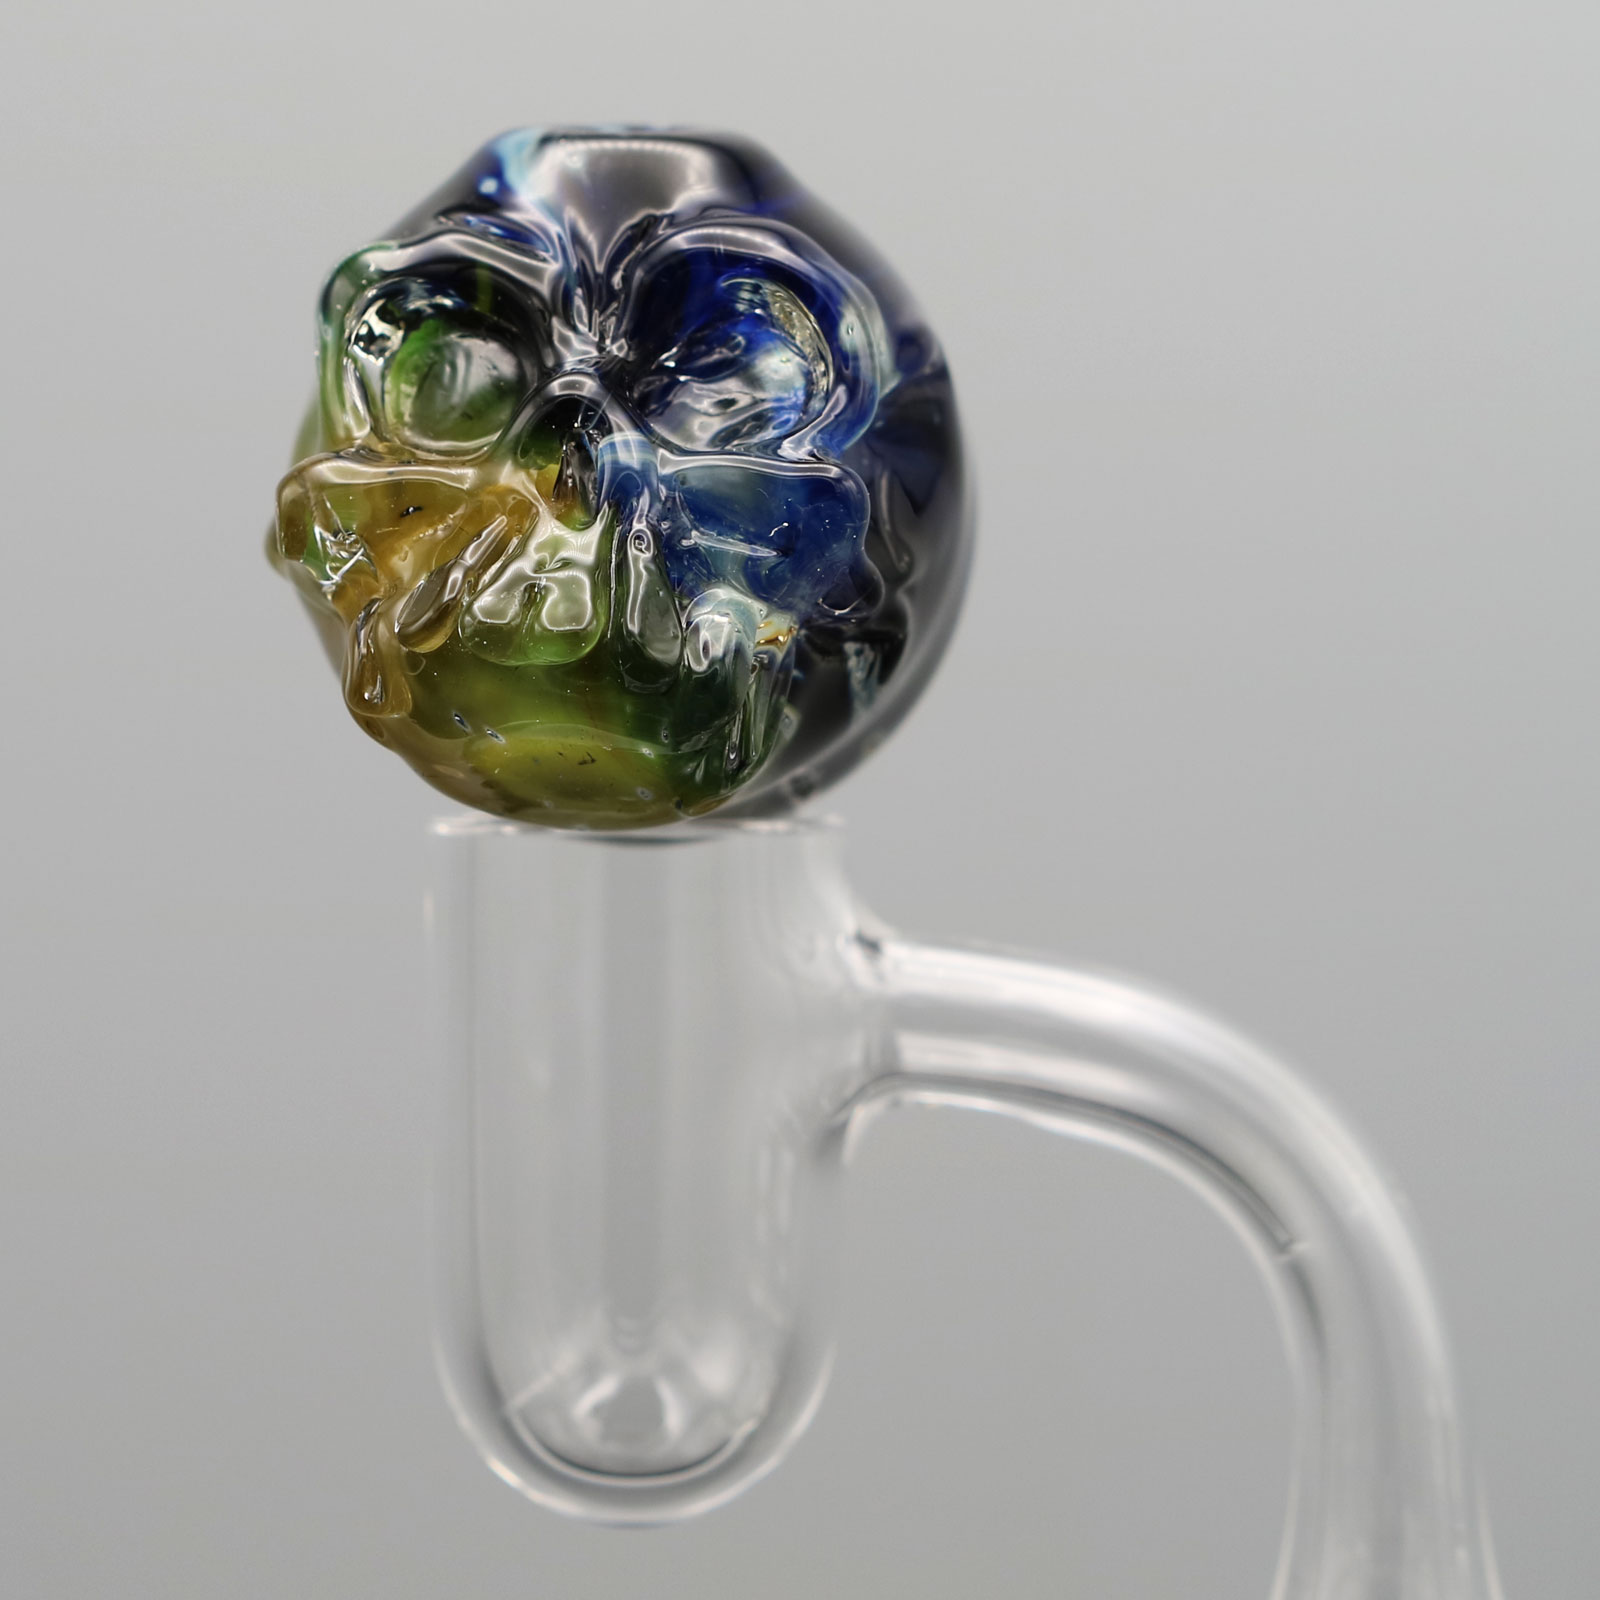 Jonny Carrcass – Spacetech Skull Bubble Cap